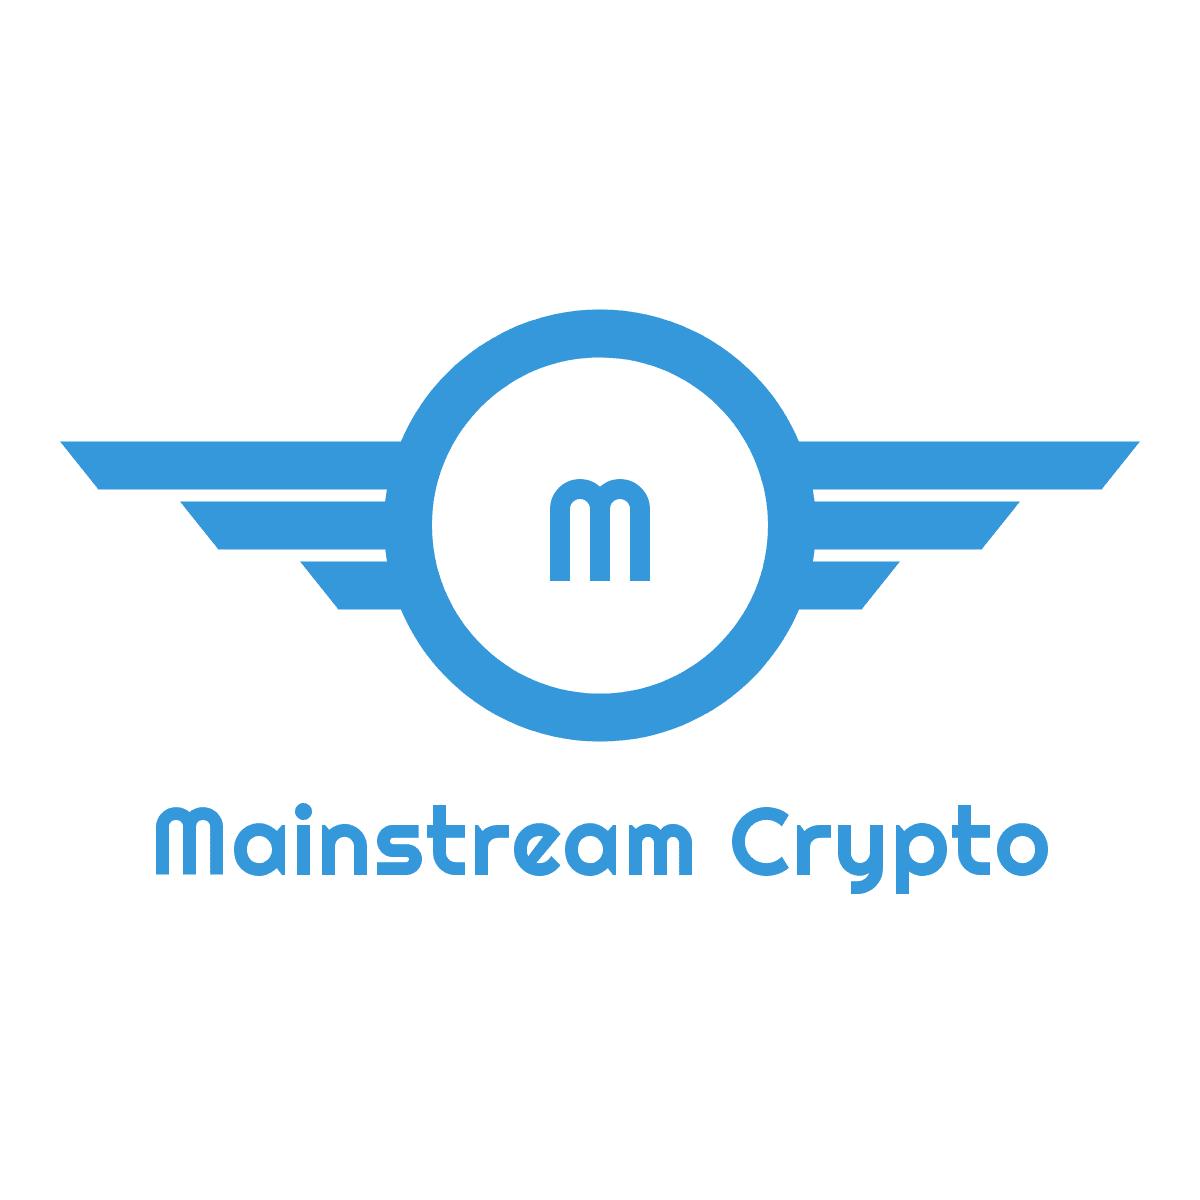 Mainstream Crypto